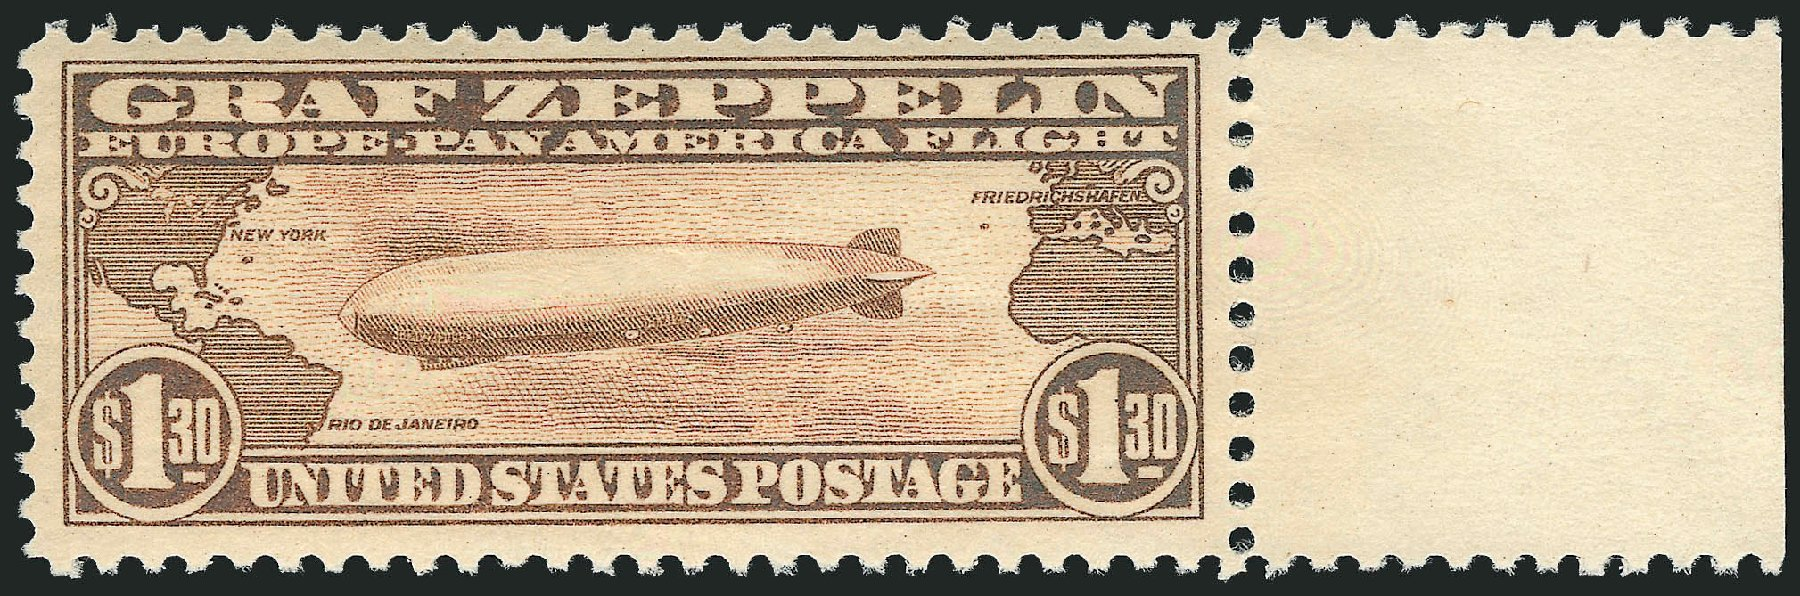 US Stamps Values Scott Cat. #C14: 1930 US$1.30 Air Graf Zeppelin. Robert Siegel Auction Galleries, Feb 2015, Sale 1092, Lot 1415